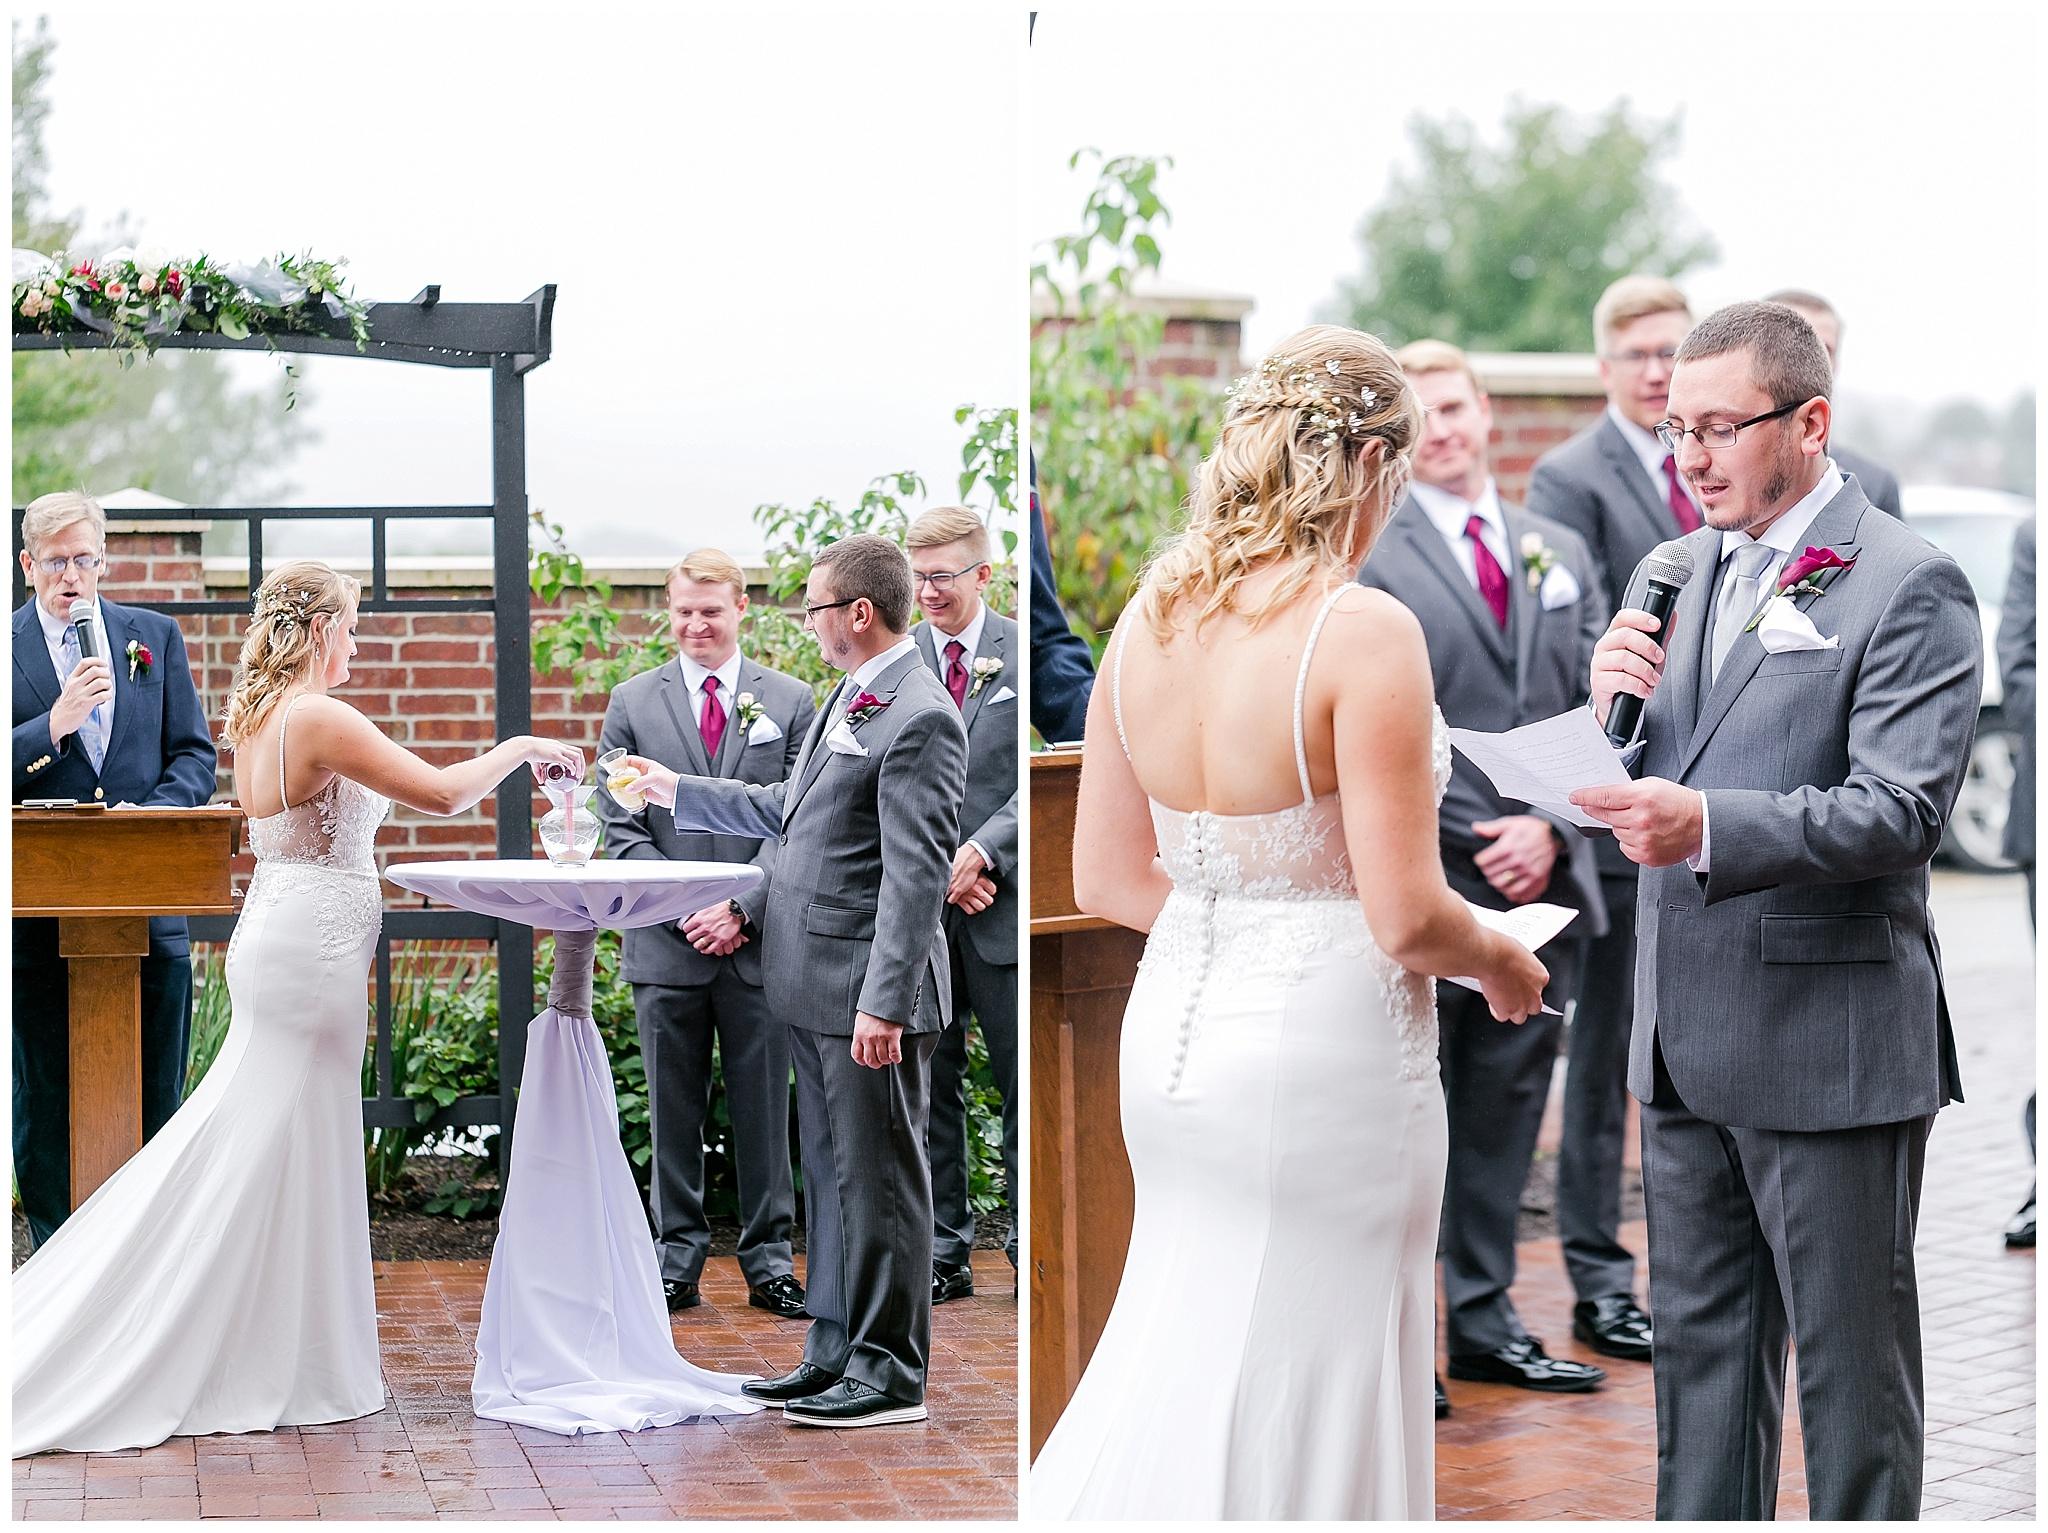 noahs_event_venue_sun_pairie_madison_wisconsin_wedding_photographers_0289.jpg